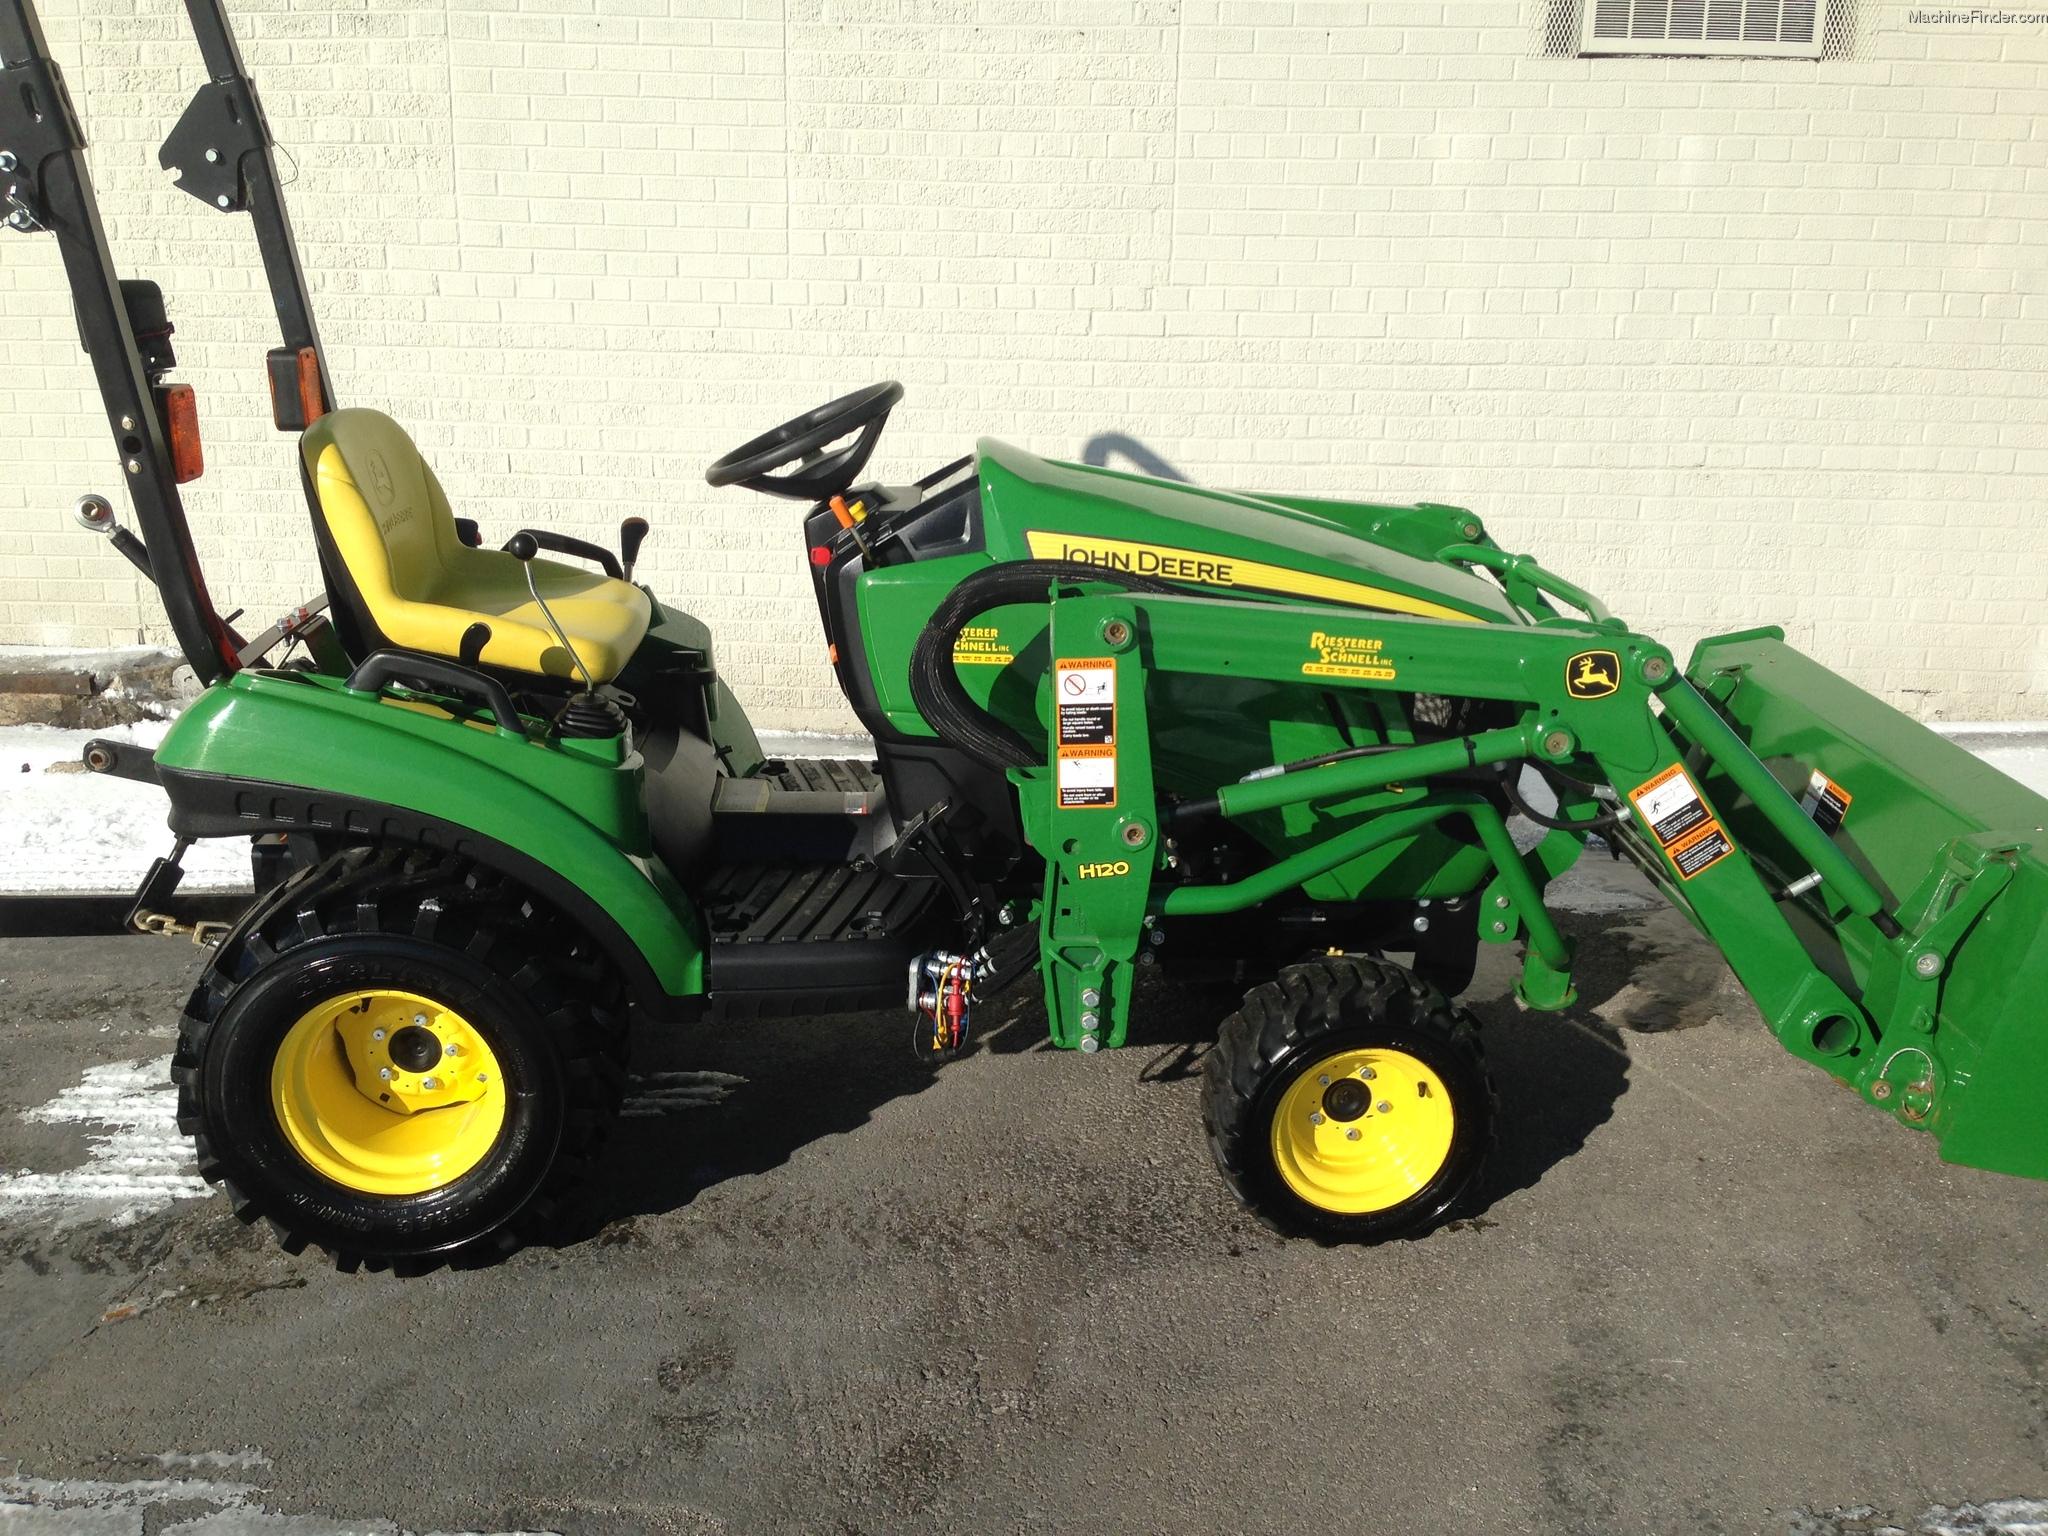 2012 John Deere 1023E Tractors - Compact (1-40hp.) - John ...